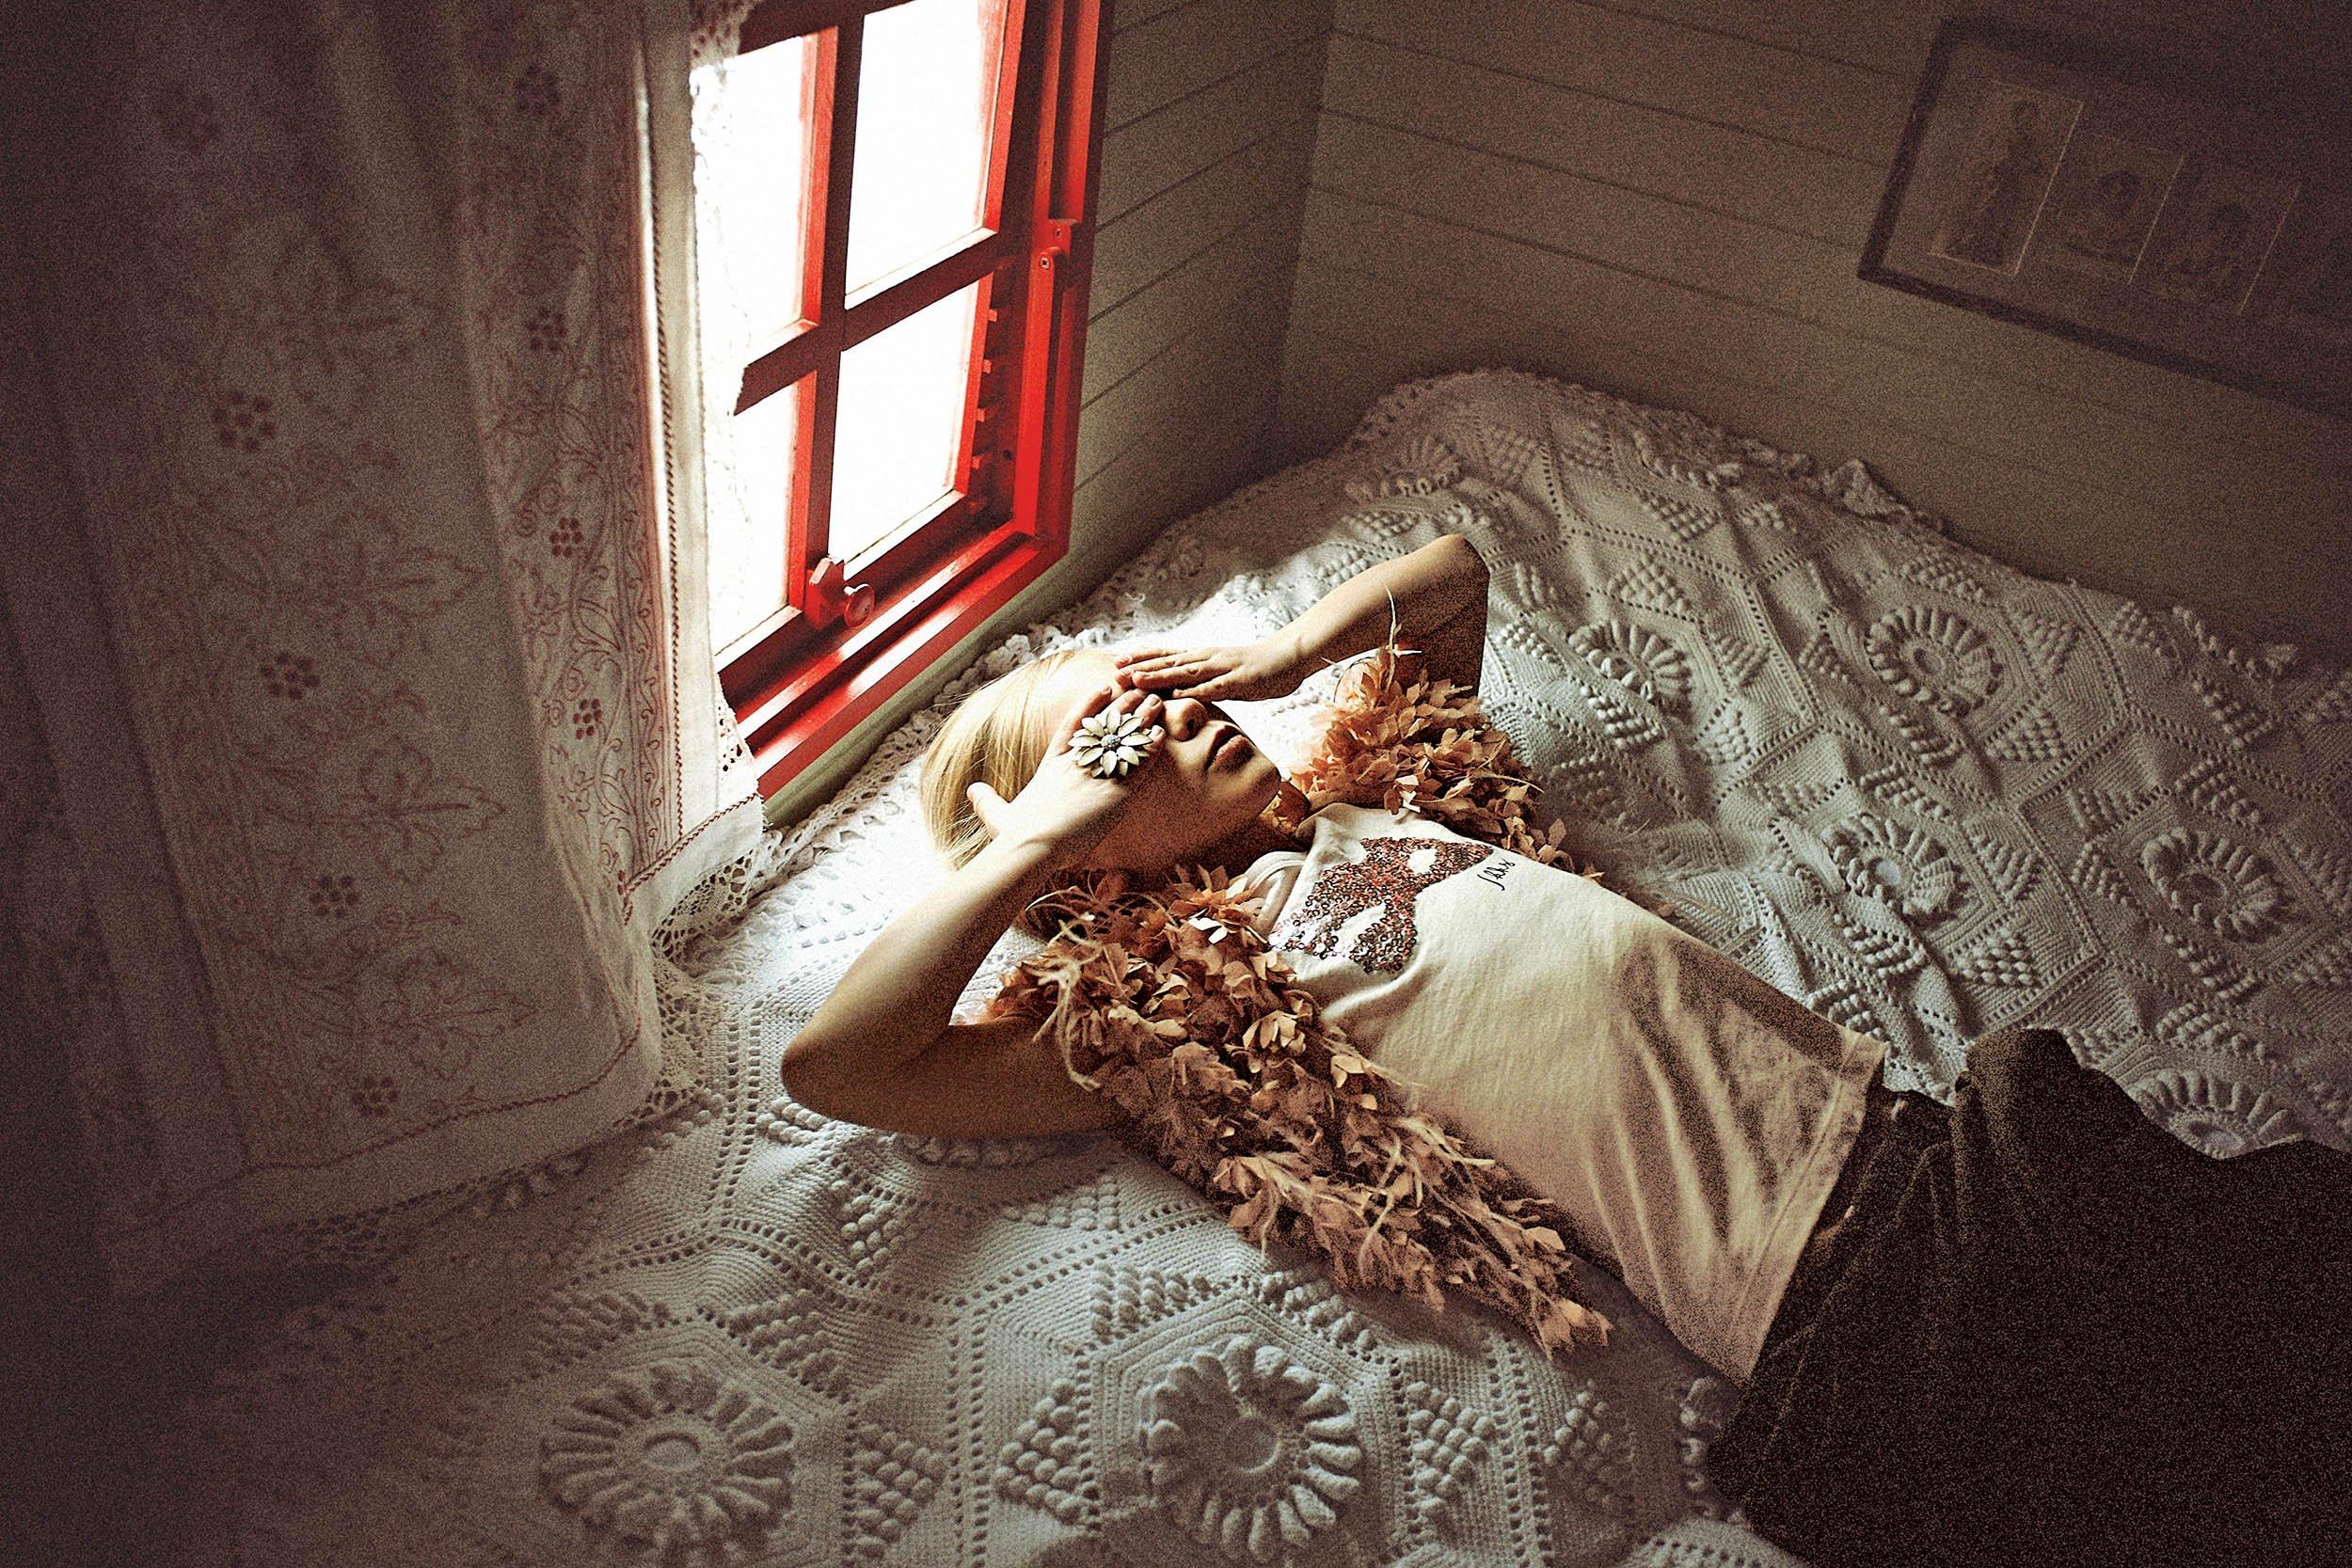 Emilie Autumn Nude Photos